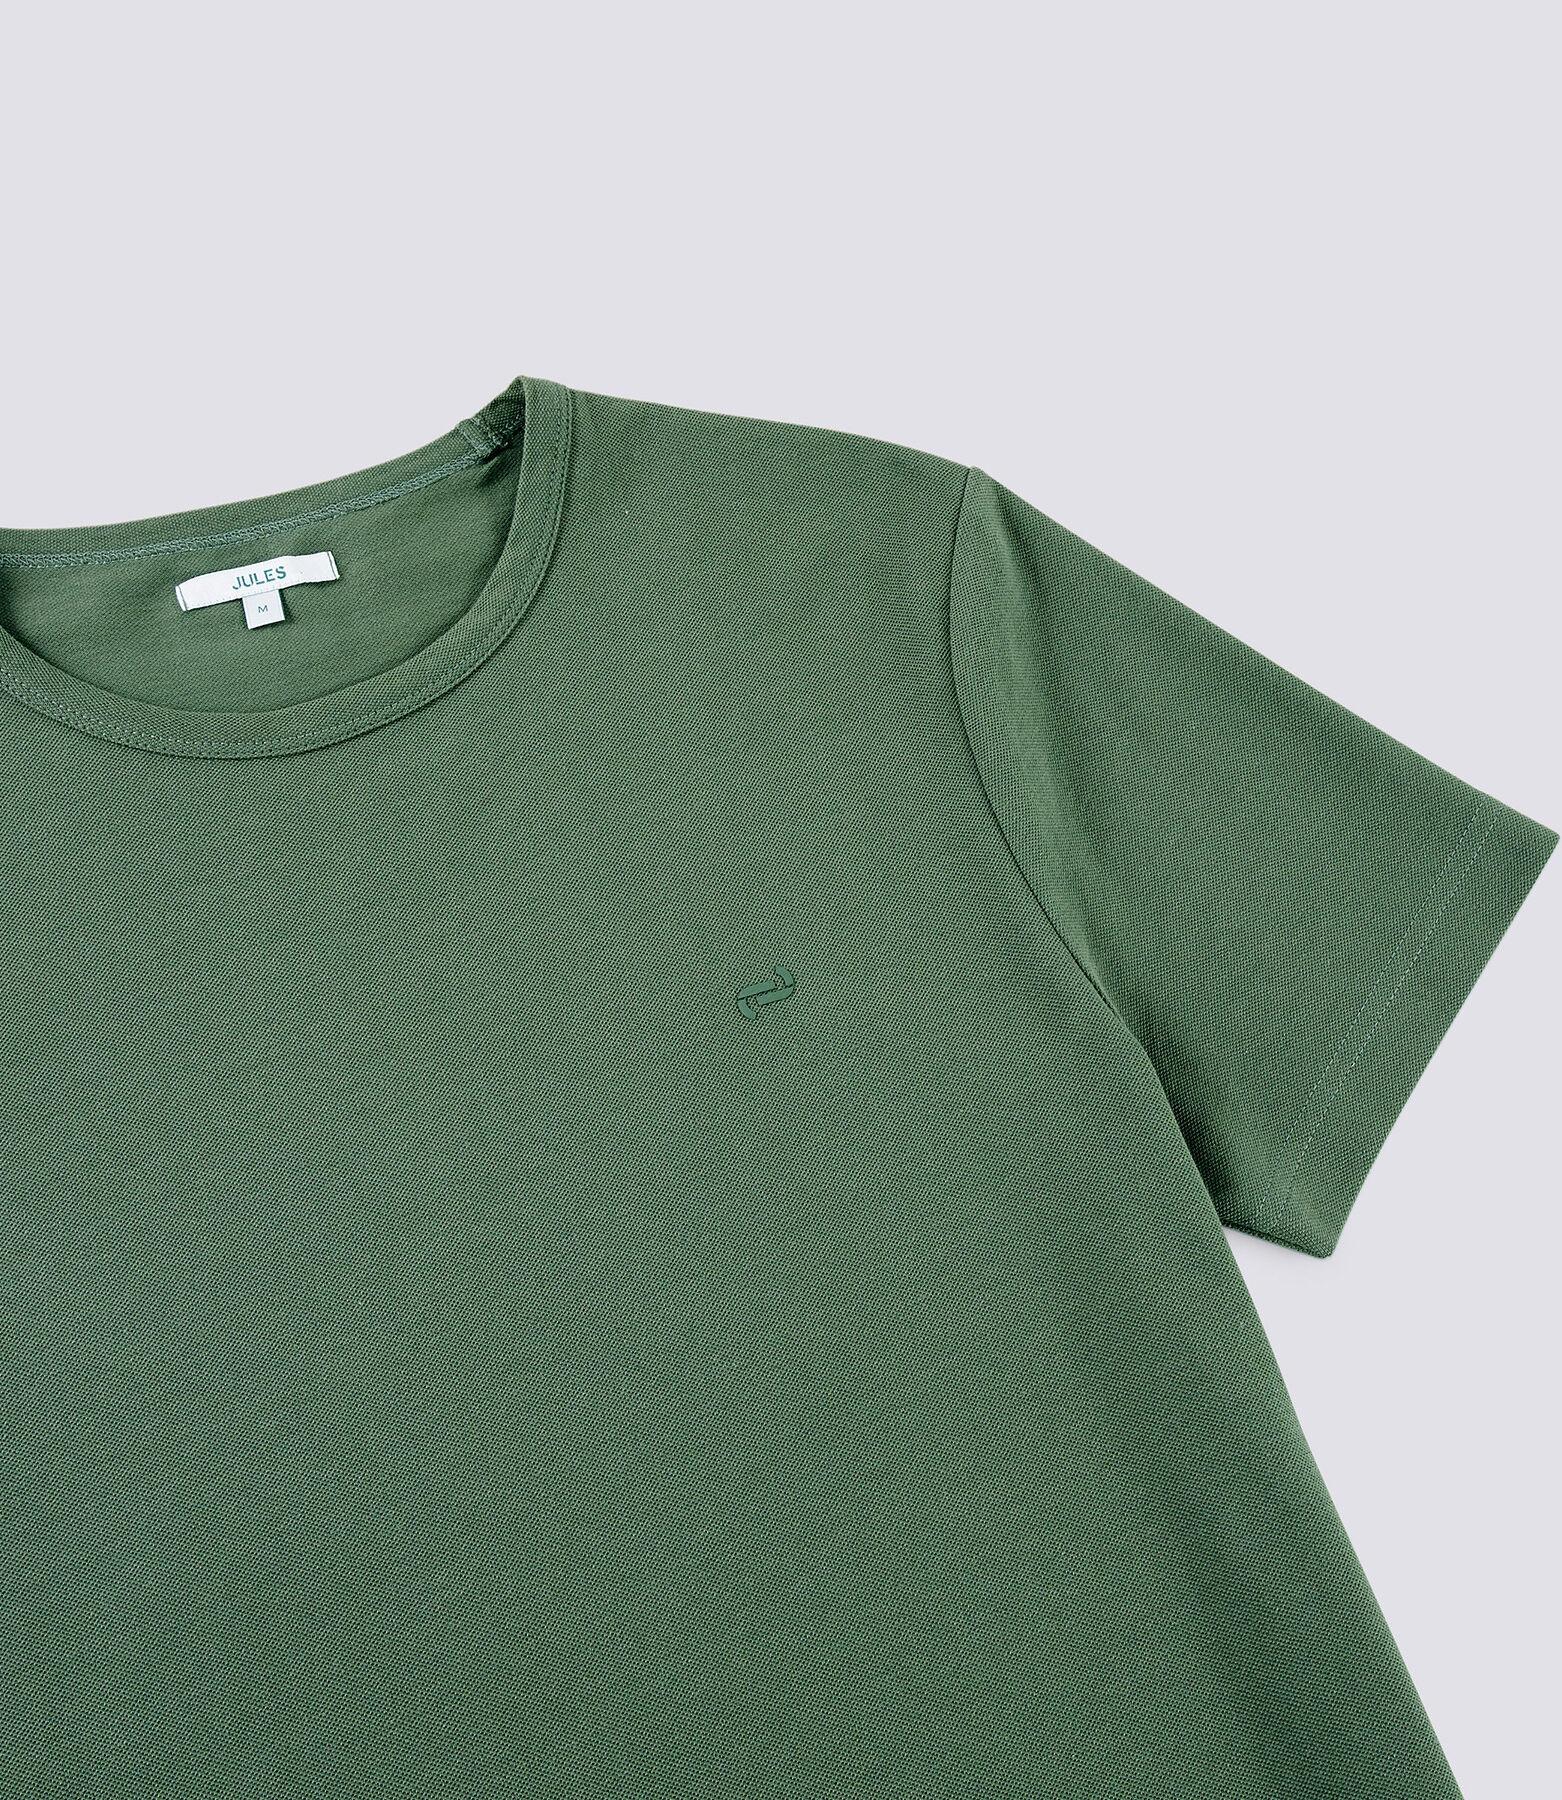 T-shirt maille piquée